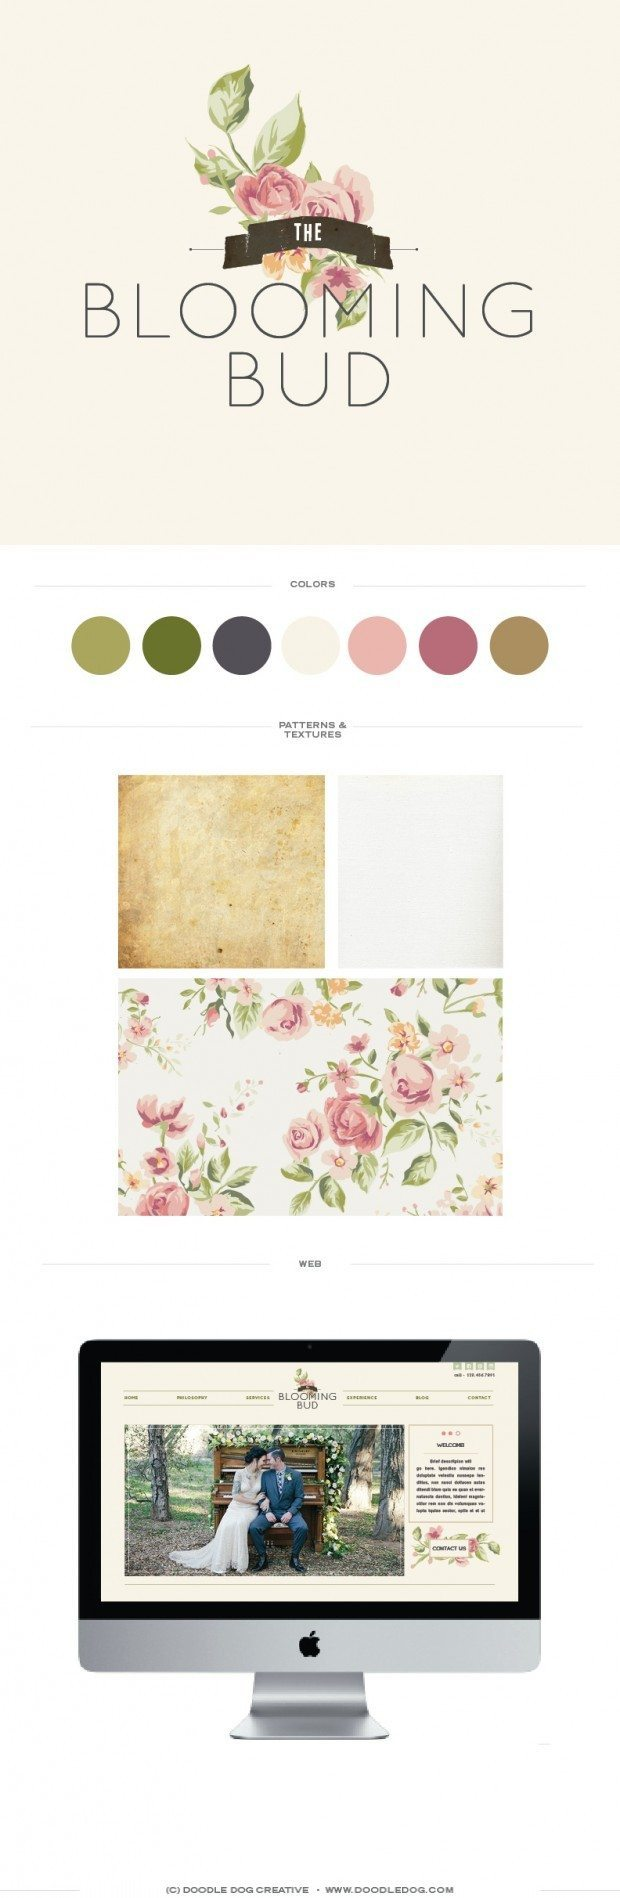 logo for florist, modern florist logo design, brand identity for florist, graphic designer wedding industry